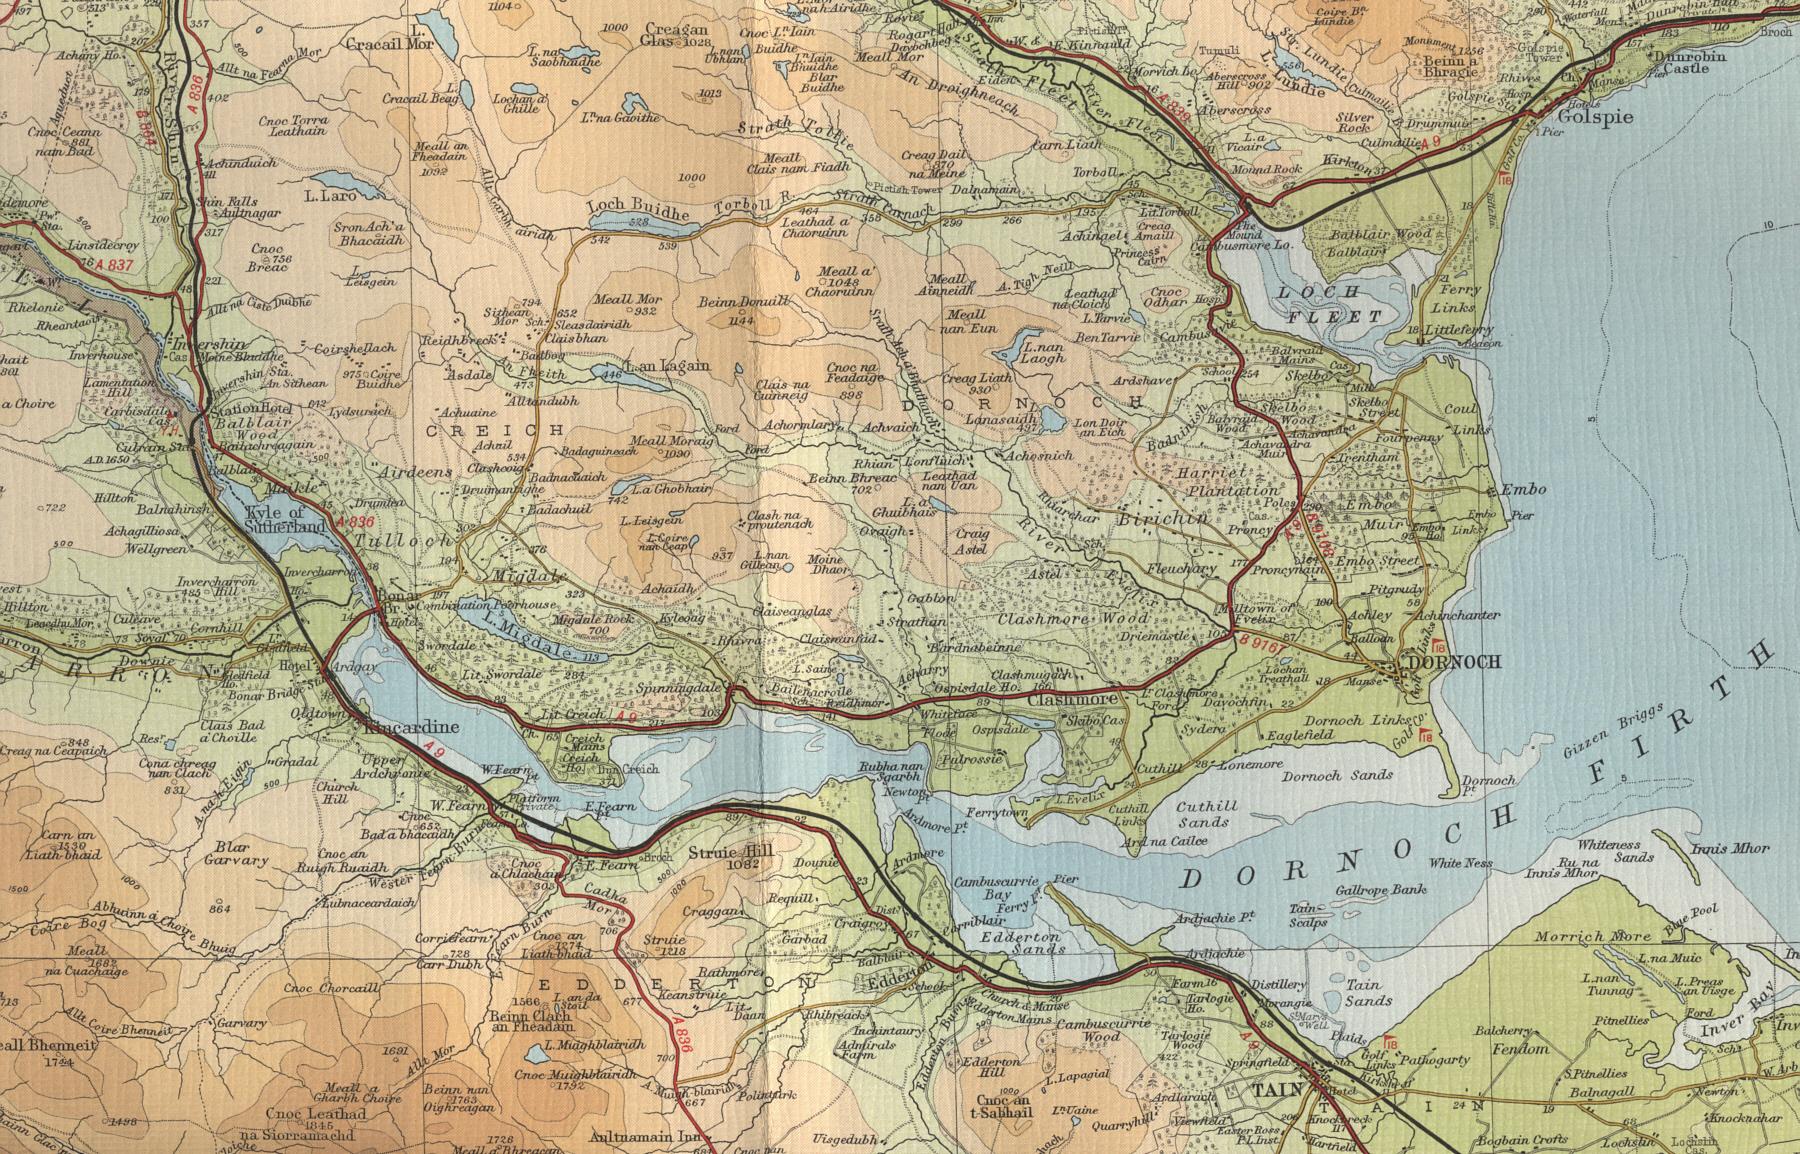 Dornoch Firth Map